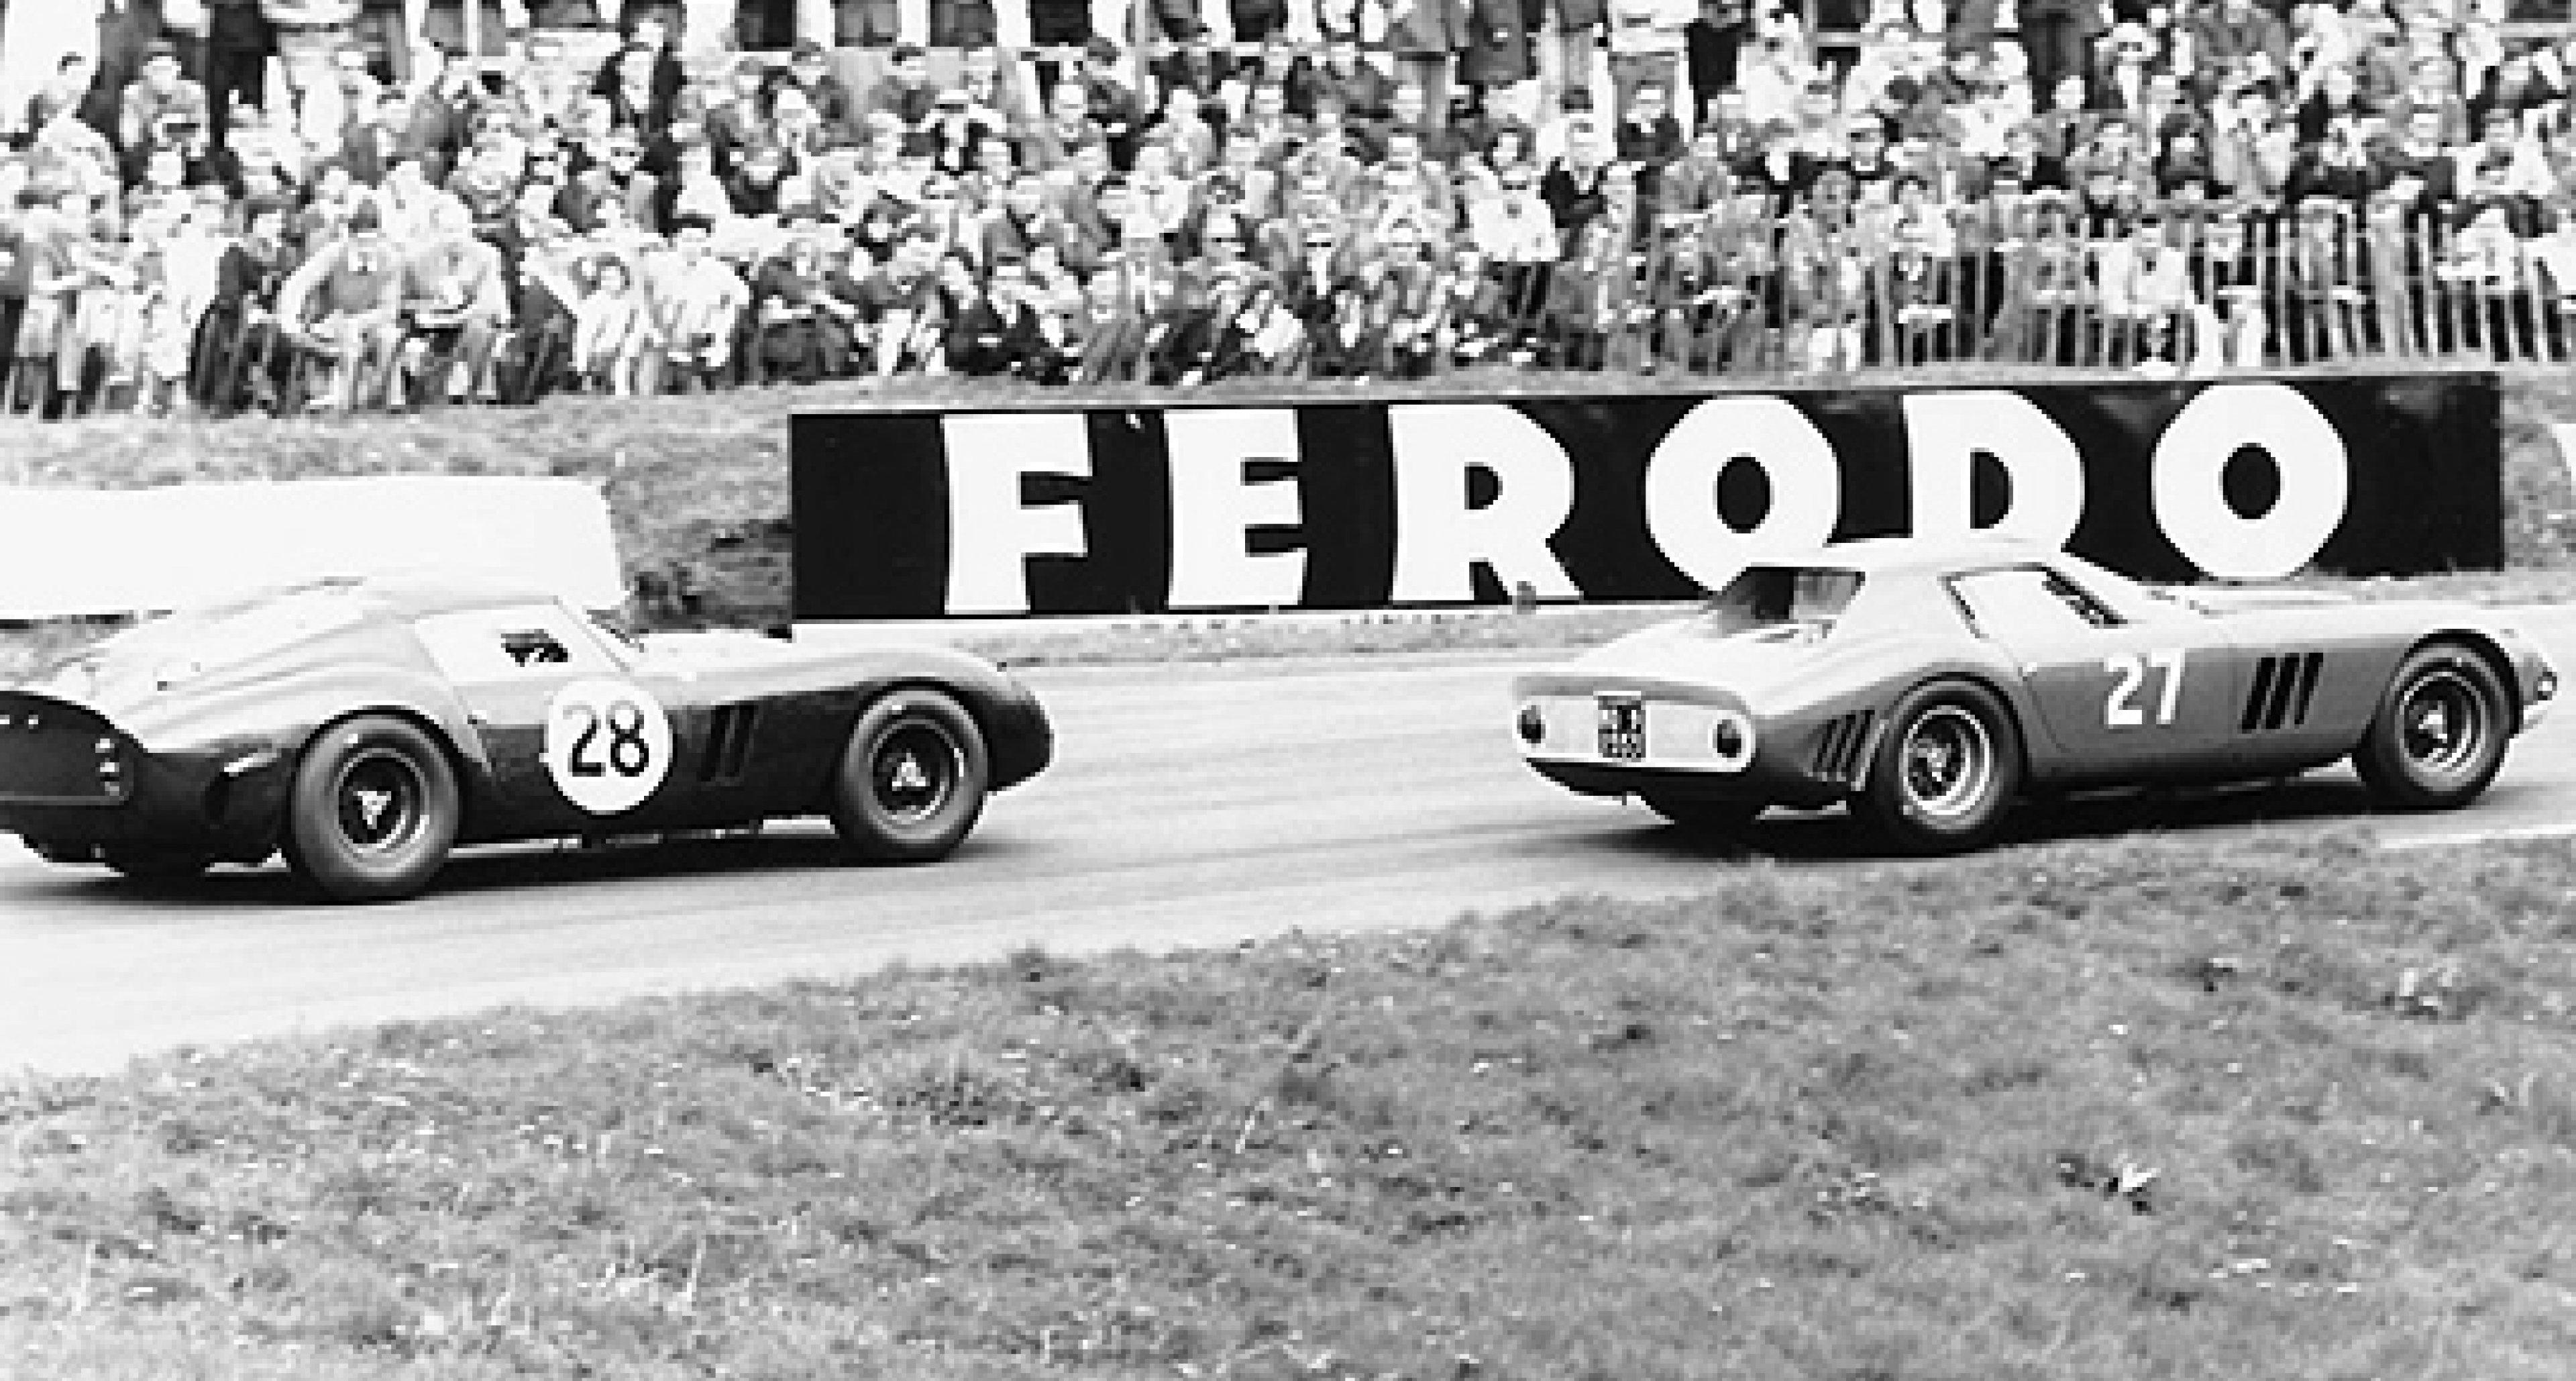 Book Review: 'Ferrari 250 GTO, The History of a Legend'